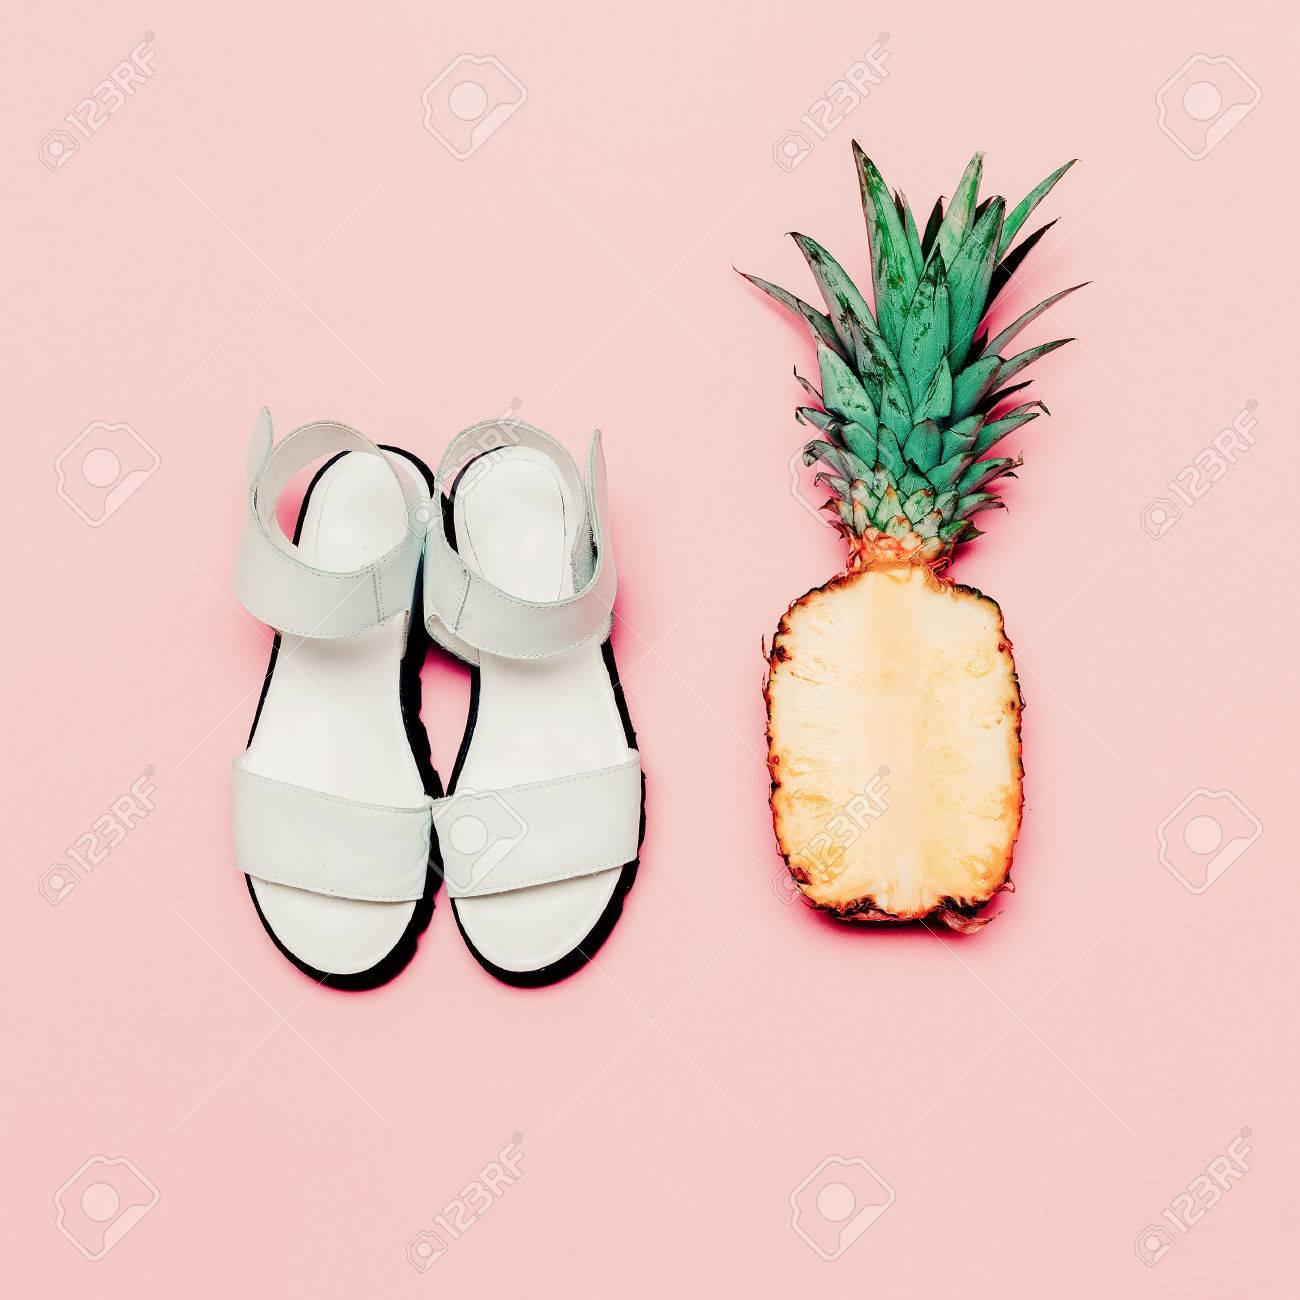 Summer fashion set. Vanilla style pineapple and sandals - 39075367